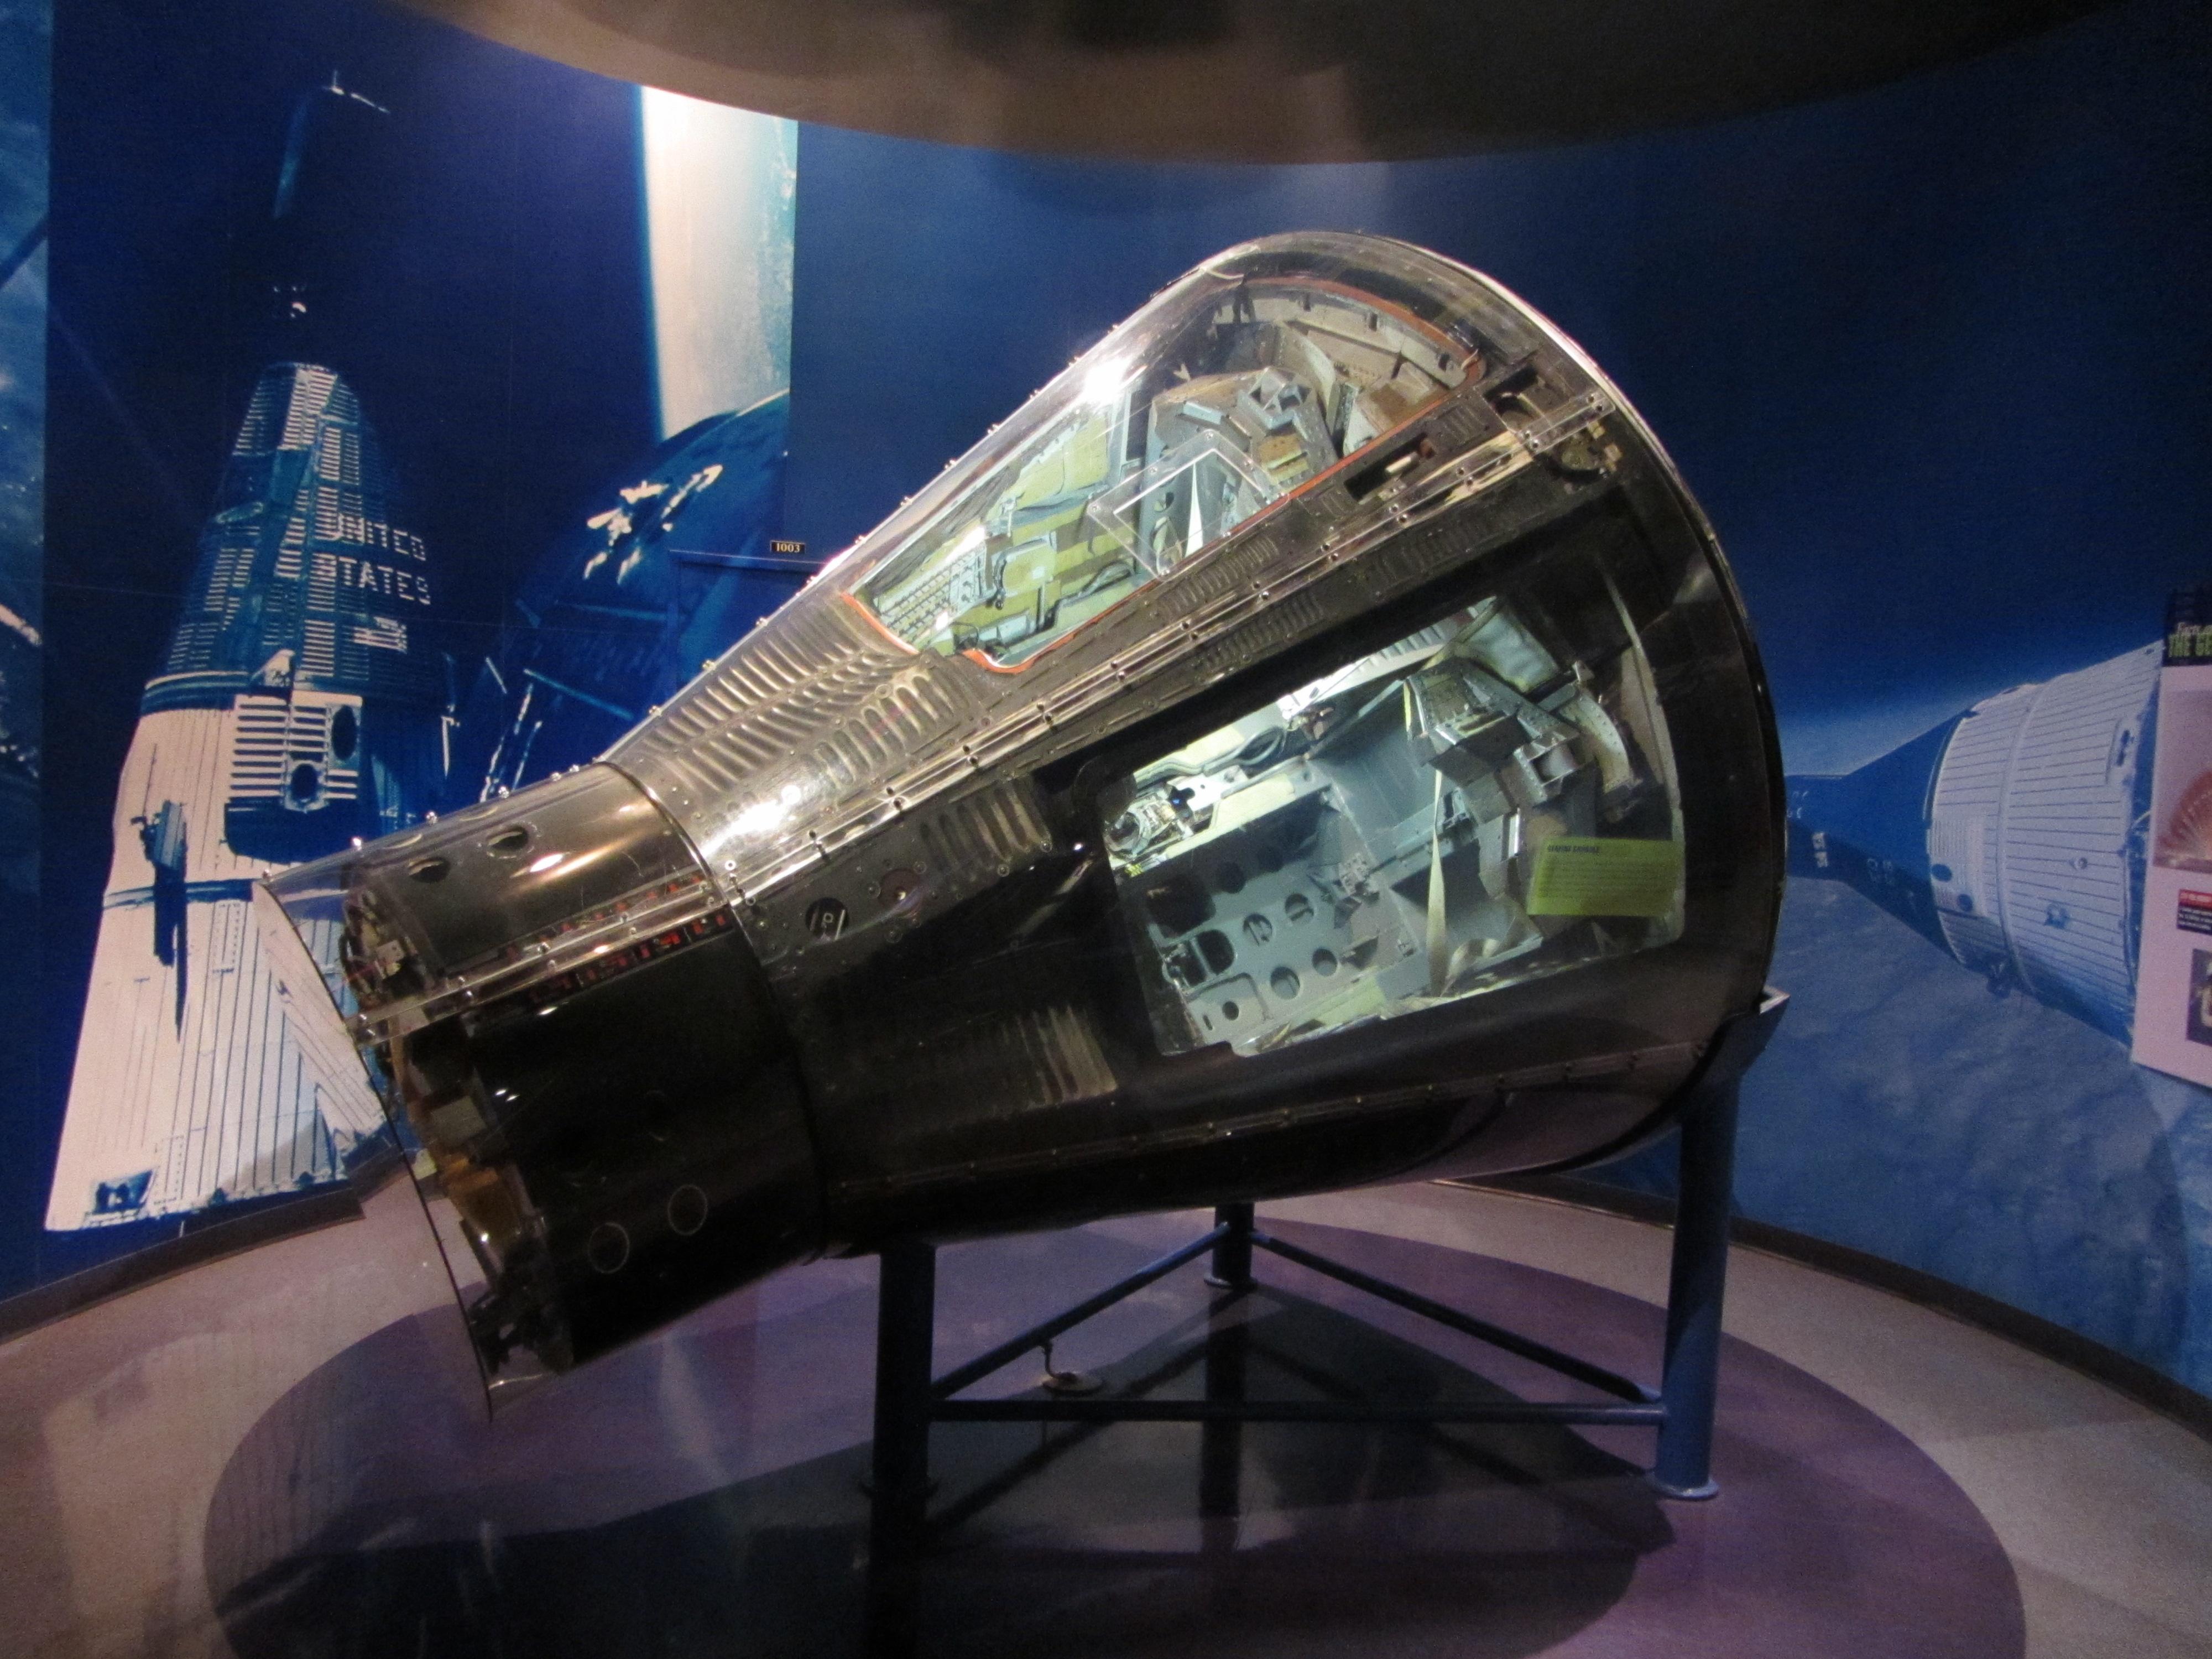 gemini space program history - photo #25